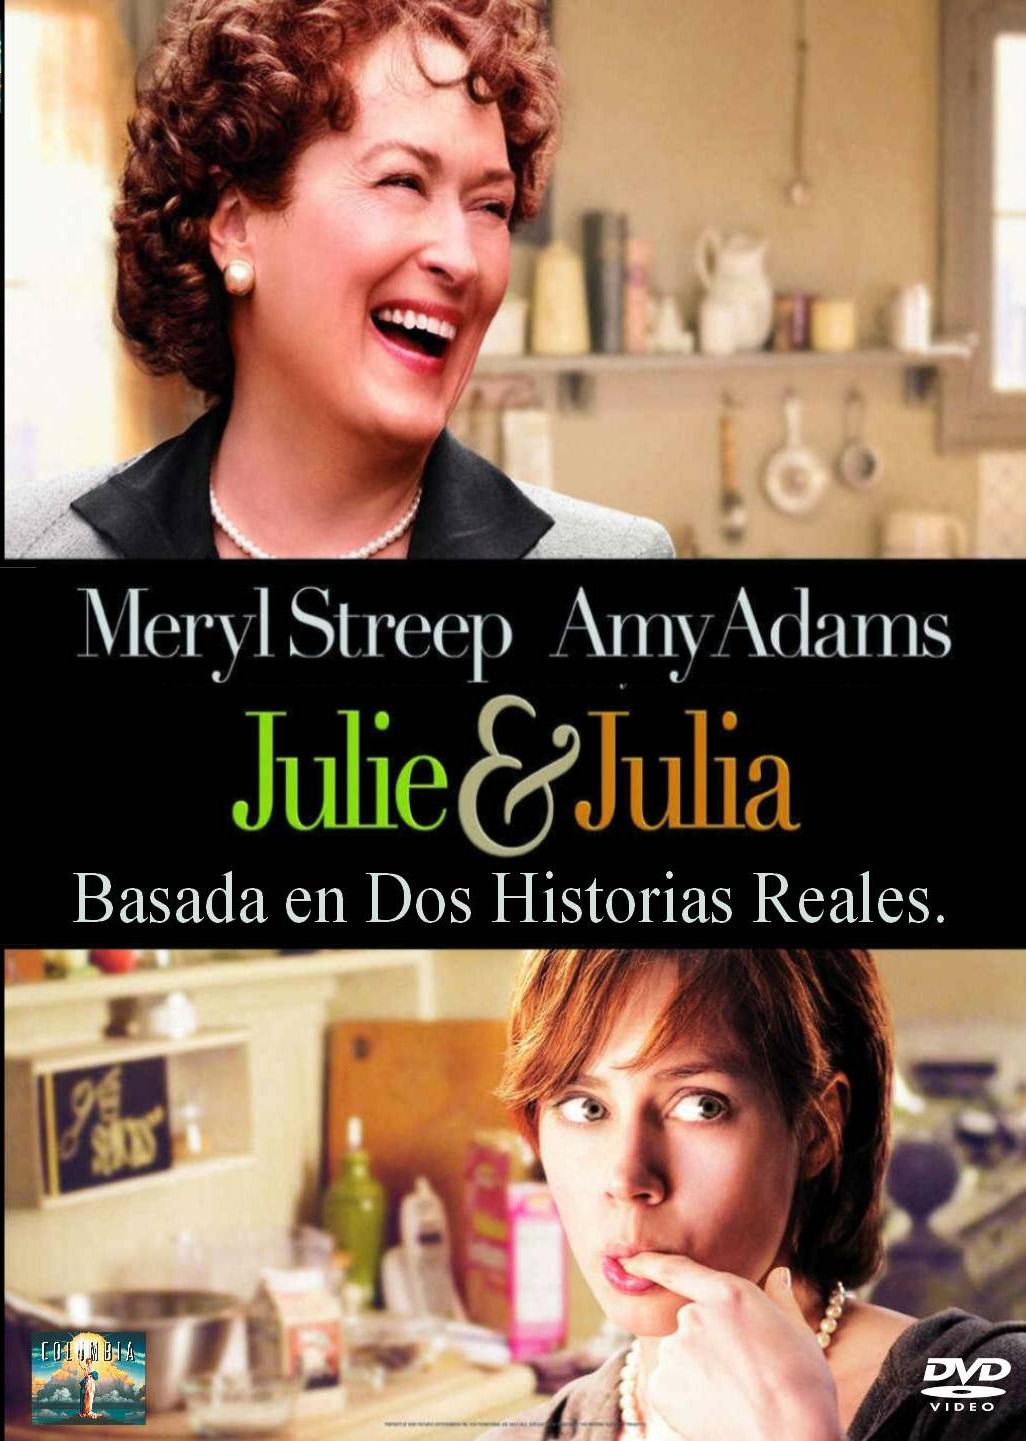 http://3.bp.blogspot.com/_opNgGsn1YIY/S8kVLnZdSzI/AAAAAAAATrA/pXof6_YoYHU/s1600/JulieANDJulia.jpg